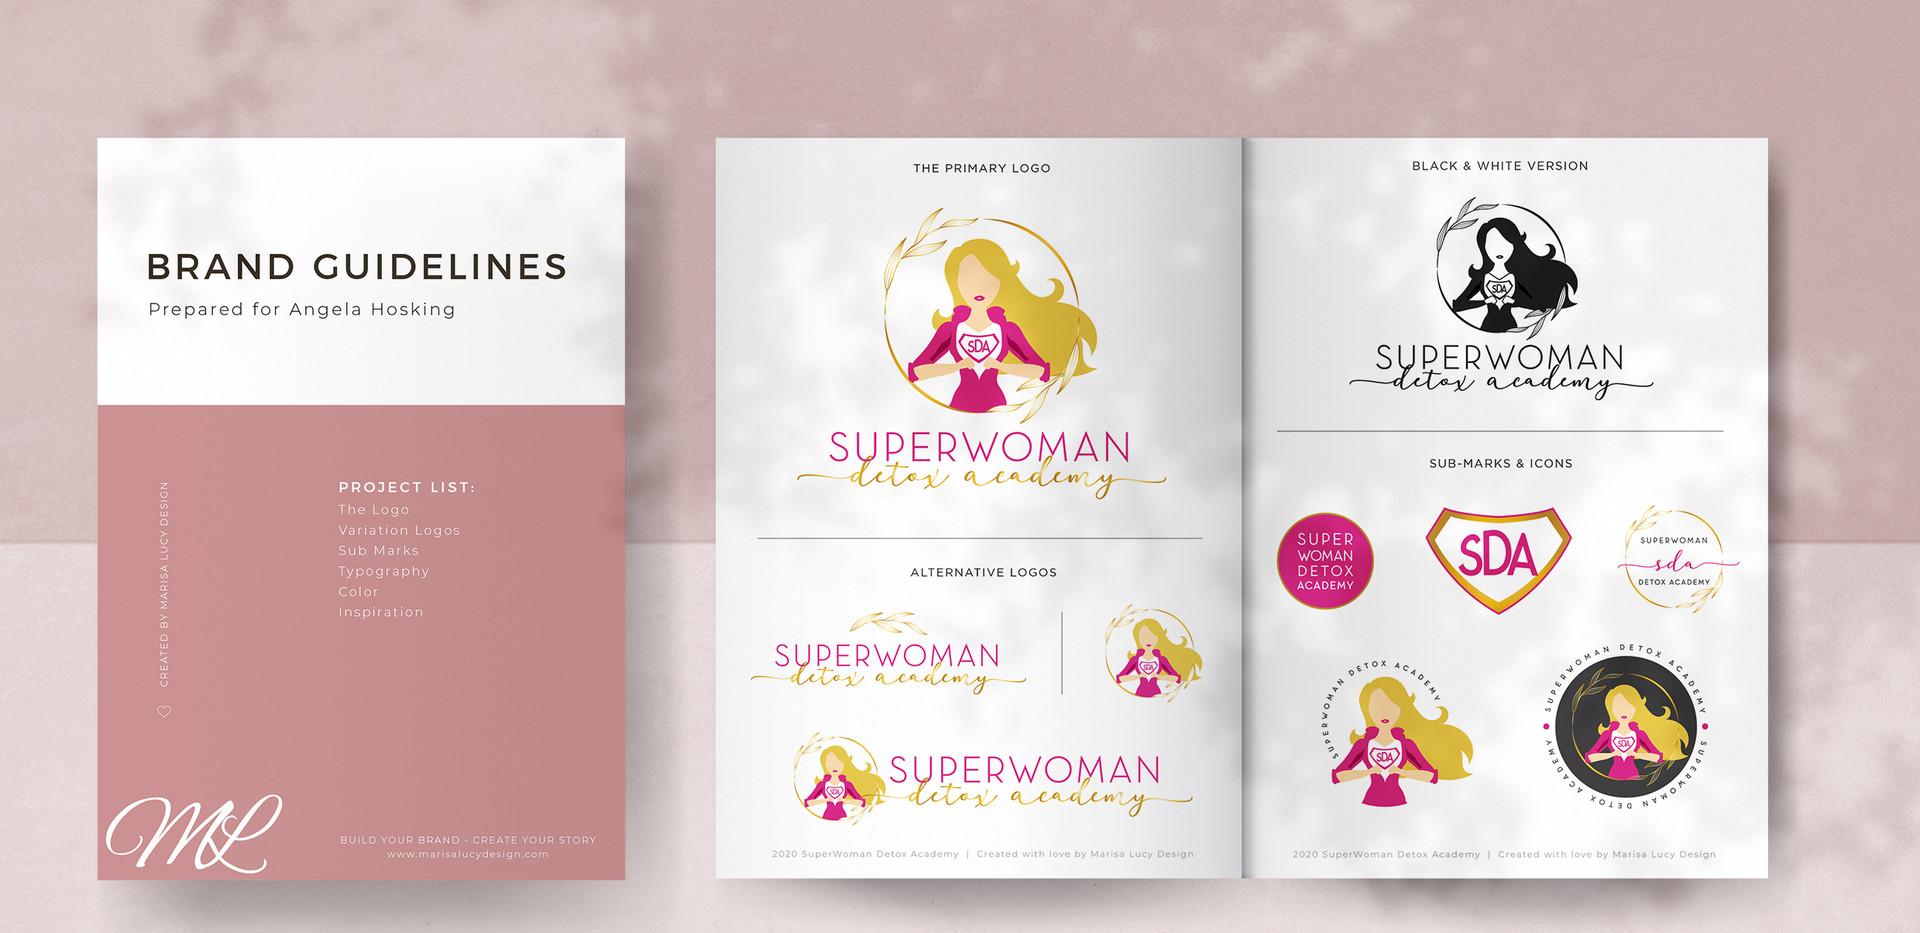 Super Woman Detox Academy Branding